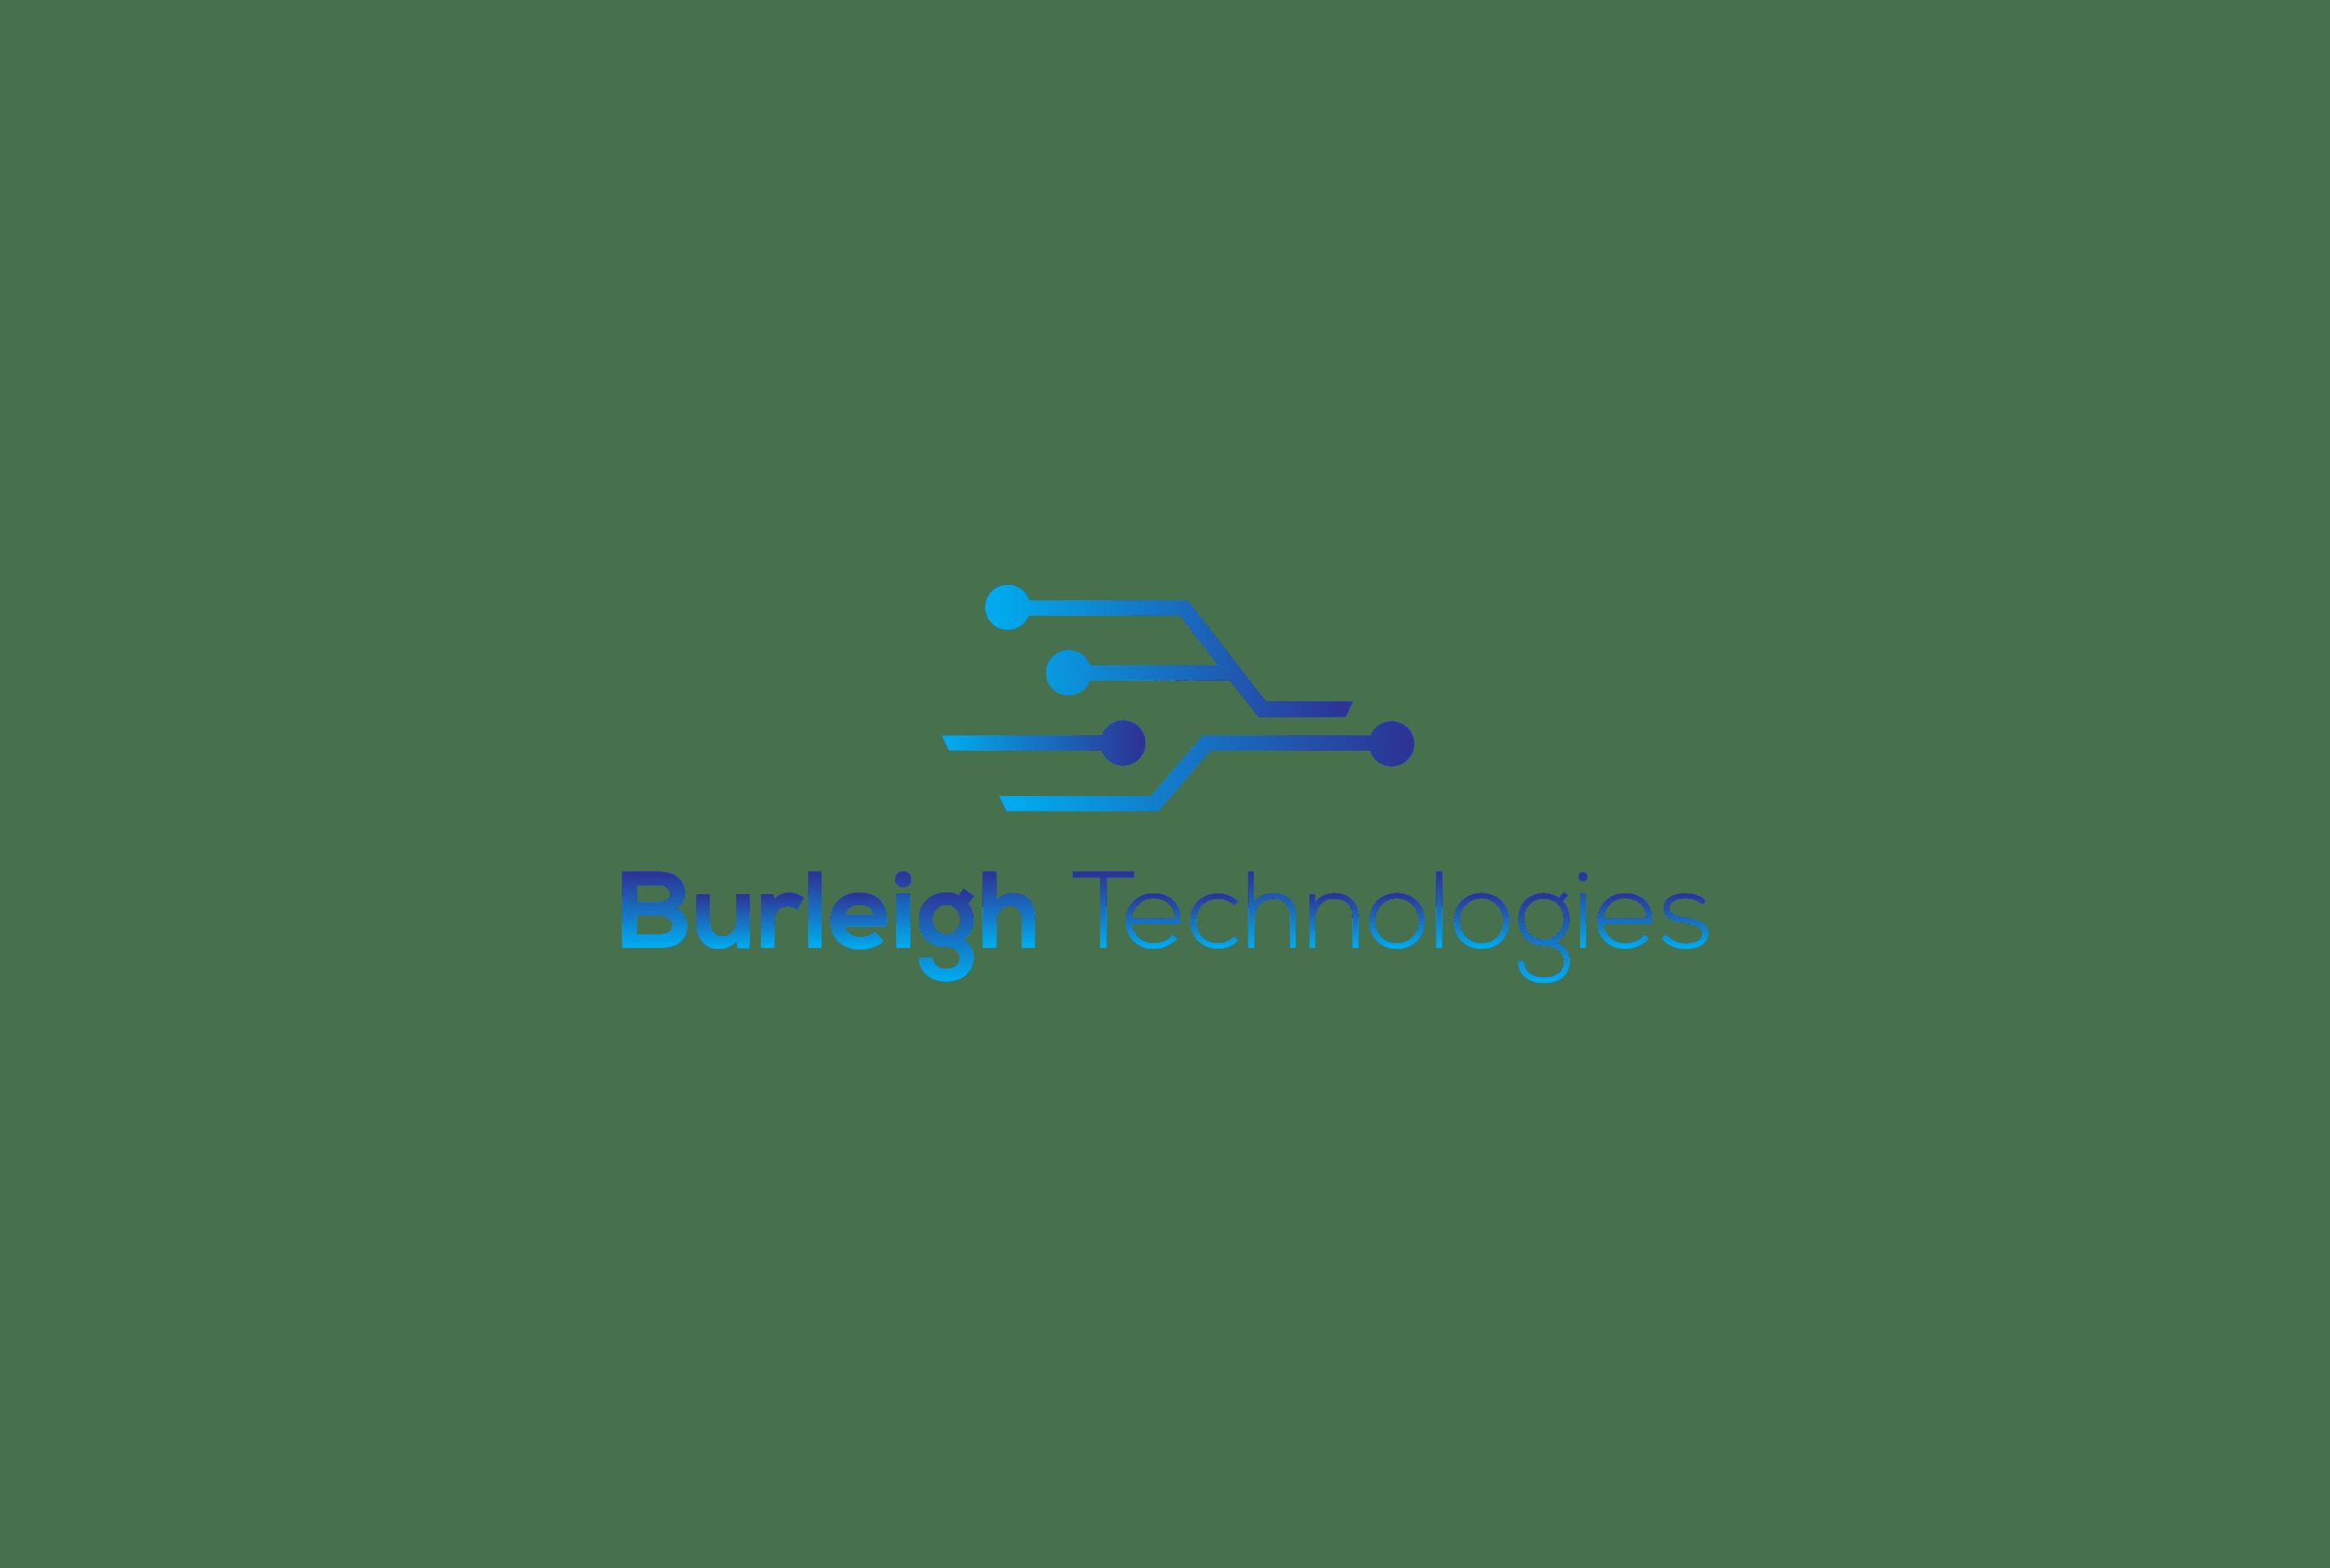 Burleigh Technologies Inc